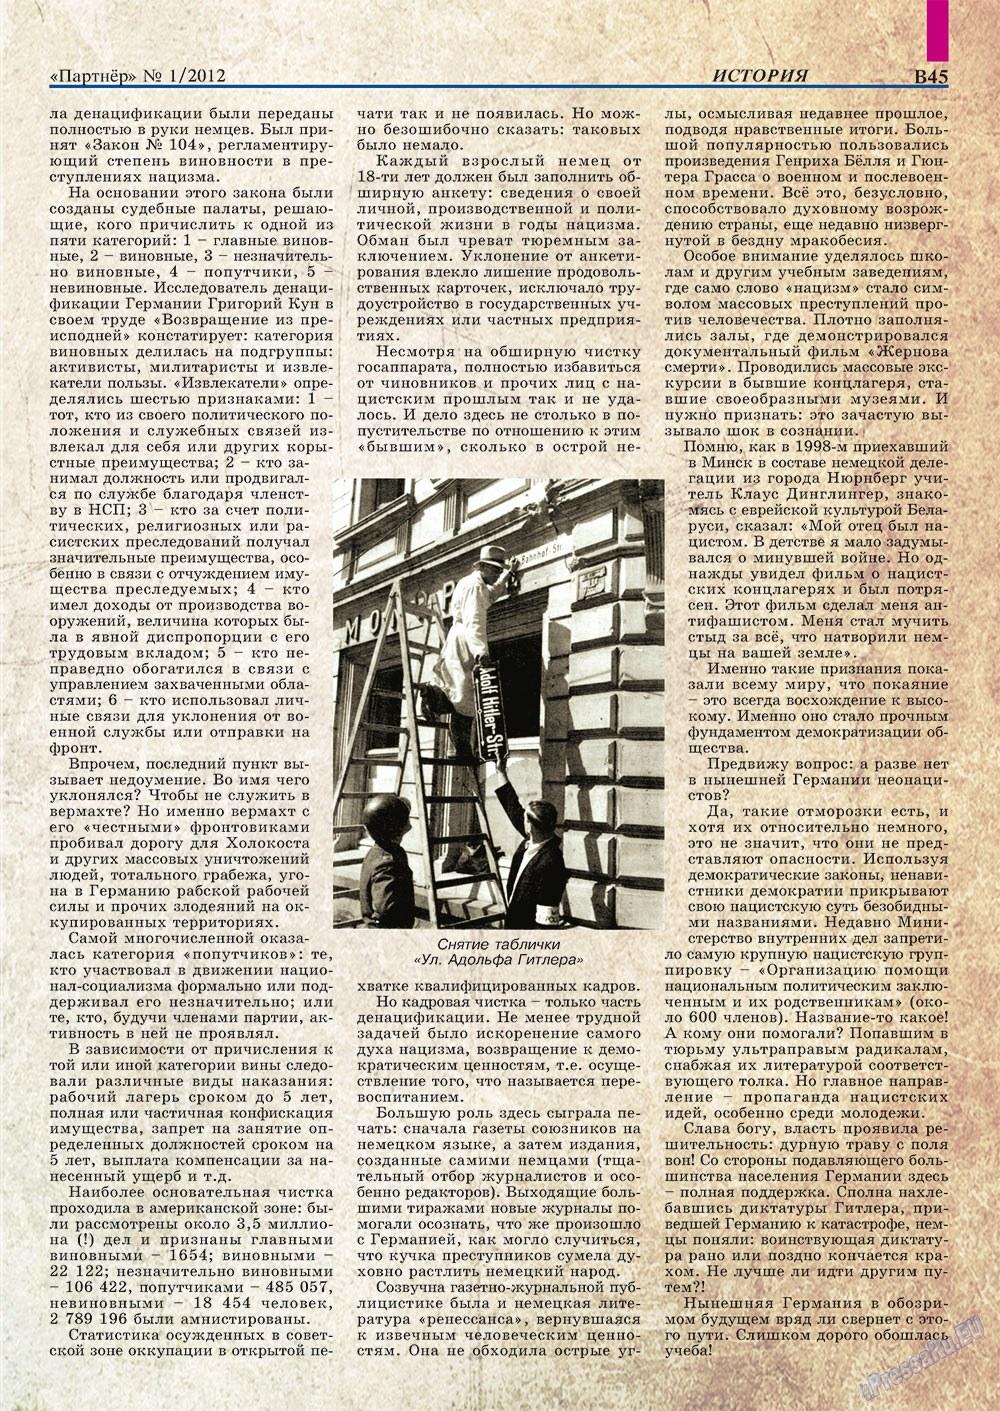 Партнер-север (журнал). 2012 год, номер 1, стр. 55